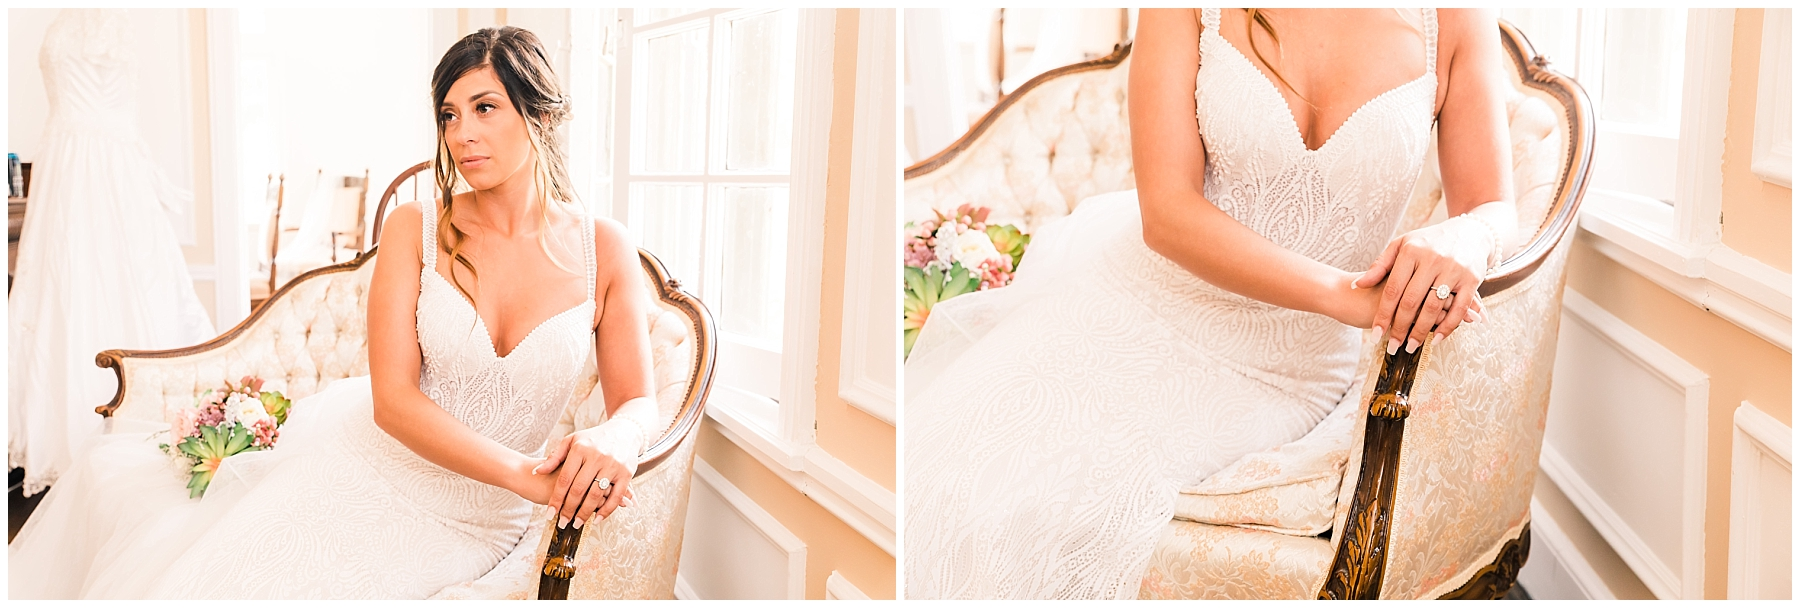 lafayette indiana wedding photography destination wedding fowler house mansion_0024.jpg